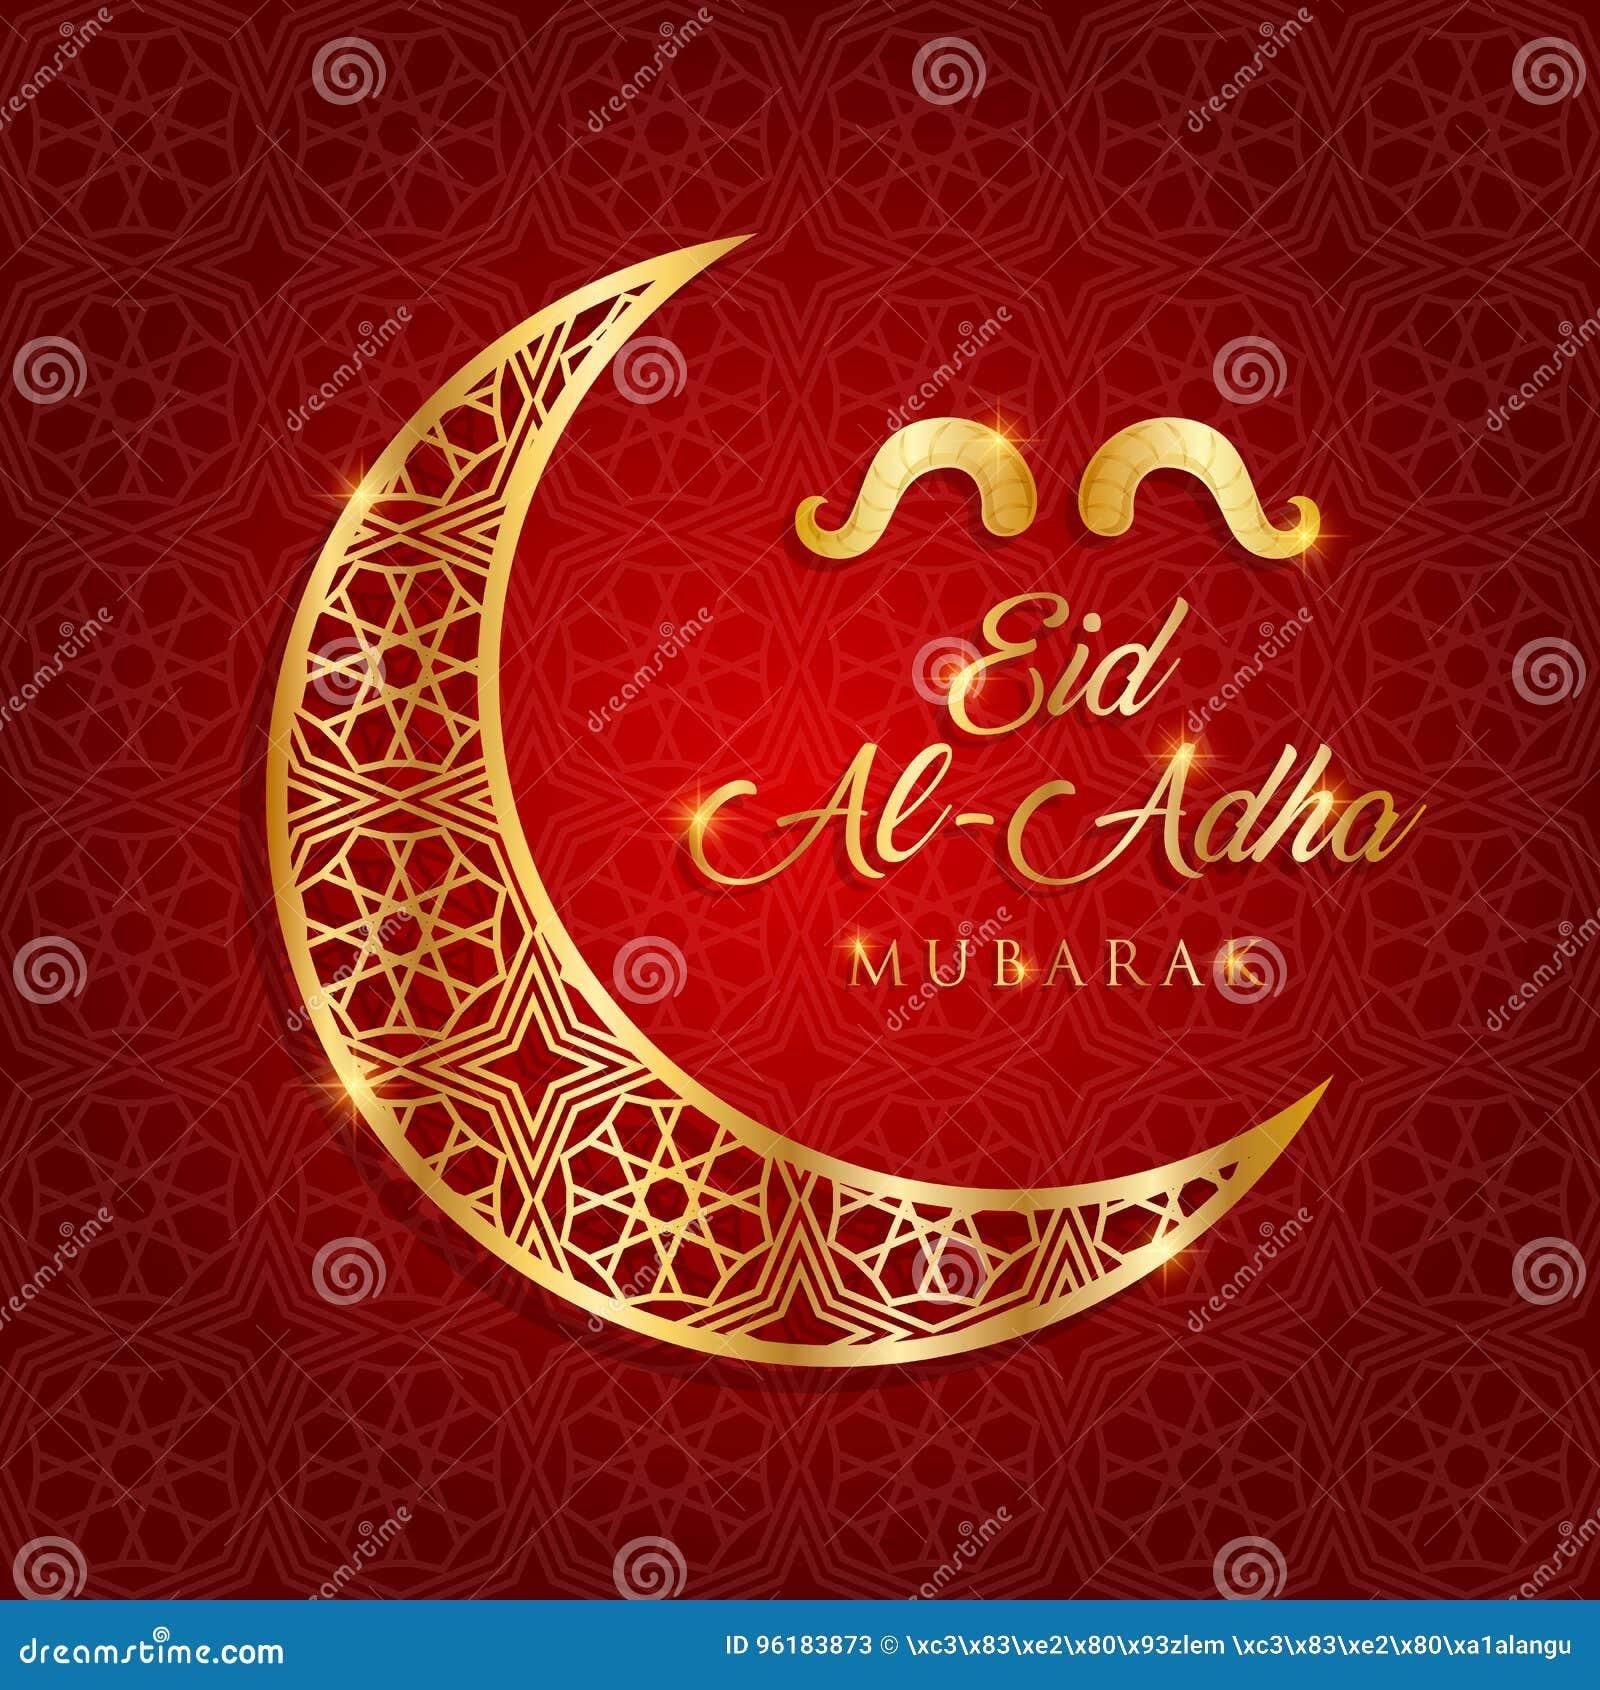 Eid Al Adha Mubarak Vector Illustration Stock Vector Illustration